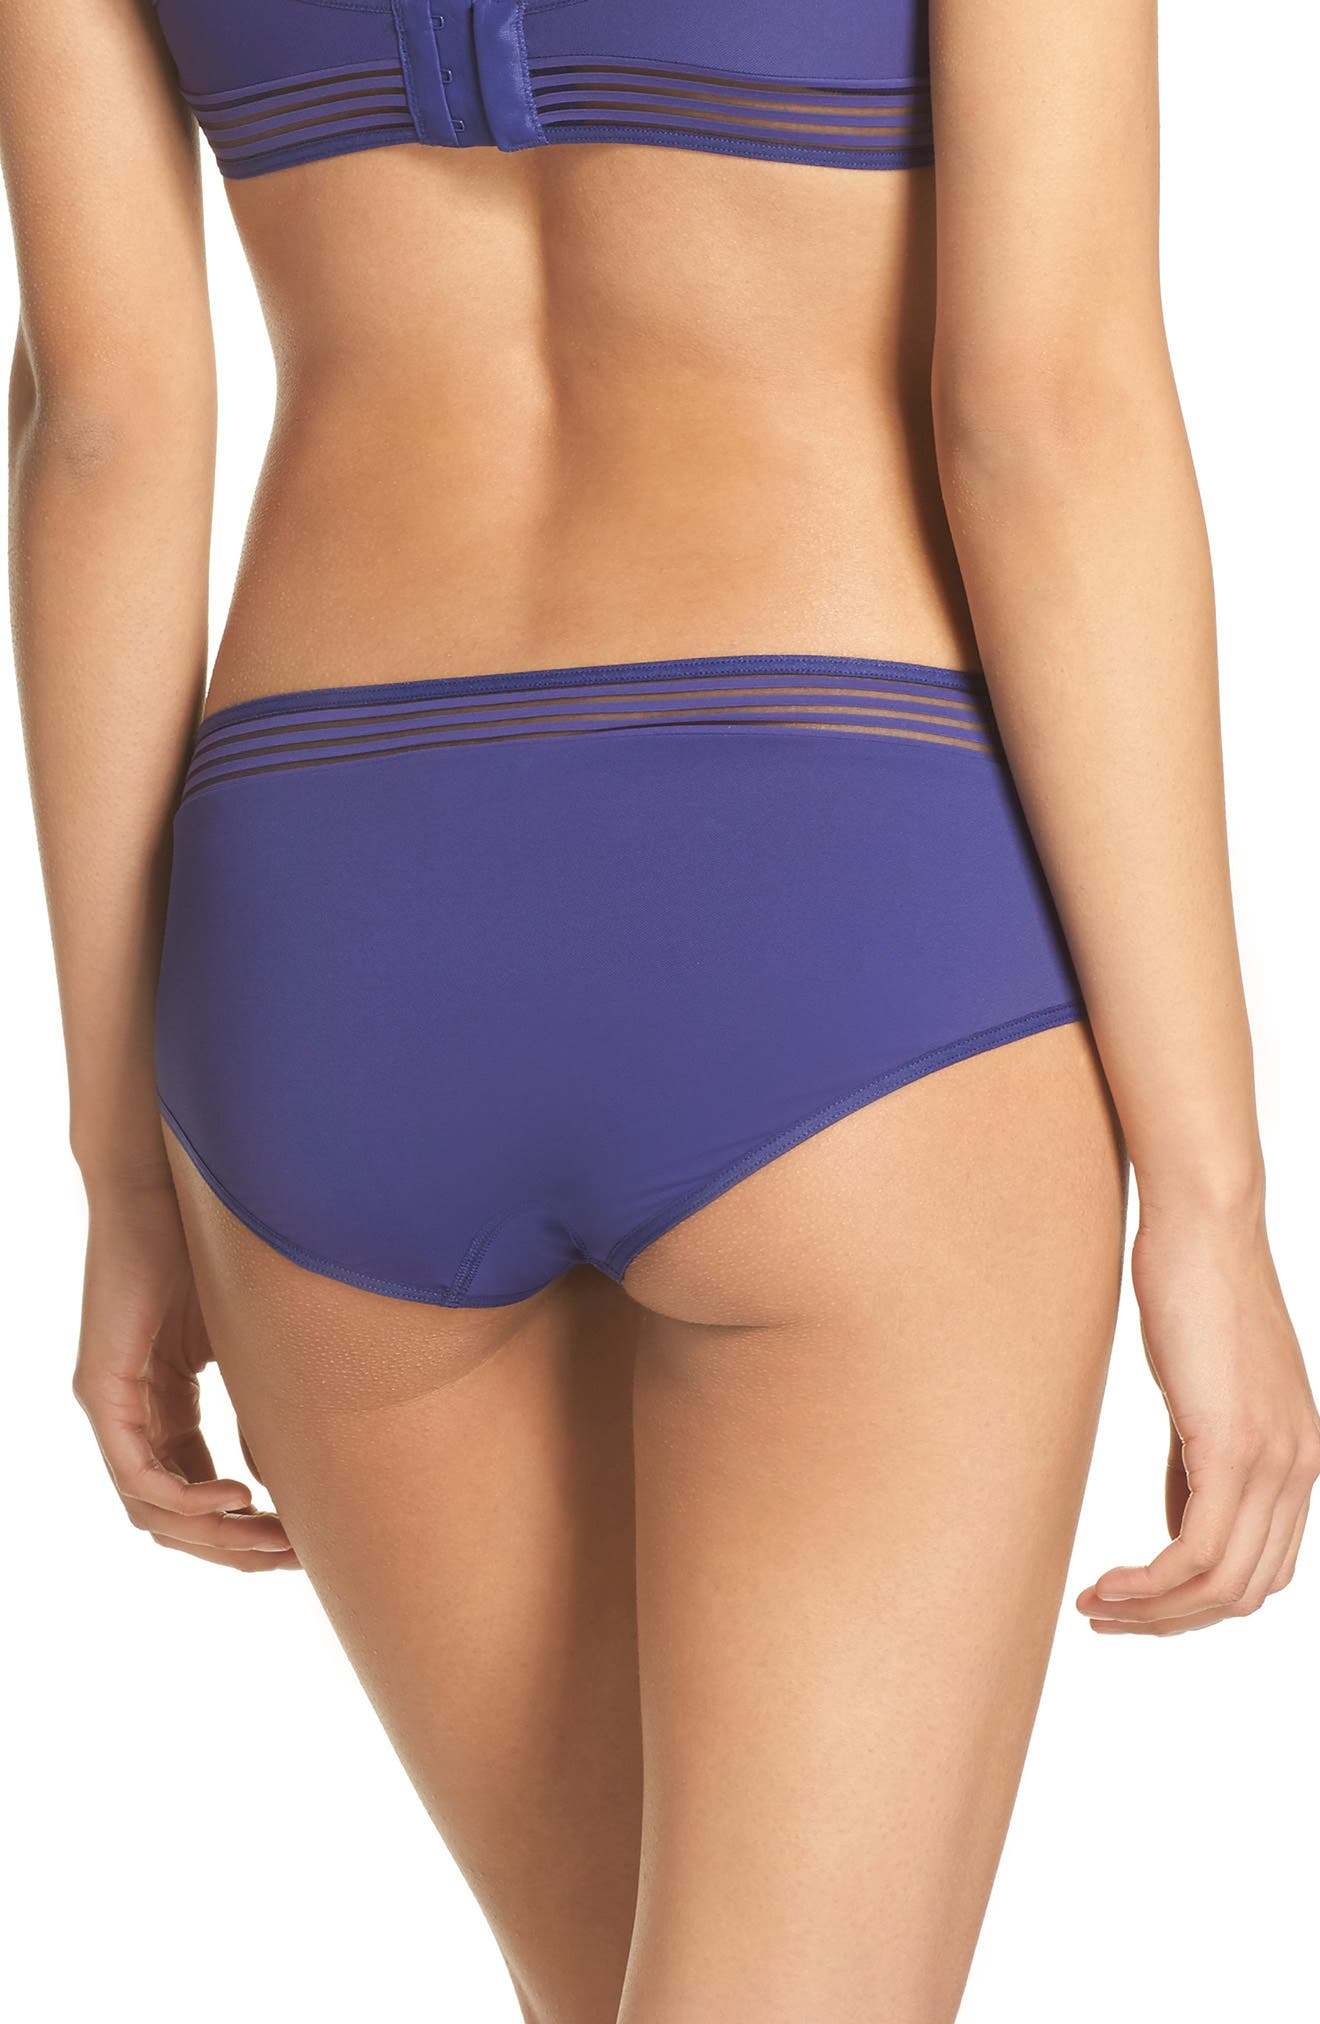 Cara Hipster Panties,                             Alternate thumbnail 2, color,                             Violet Blue